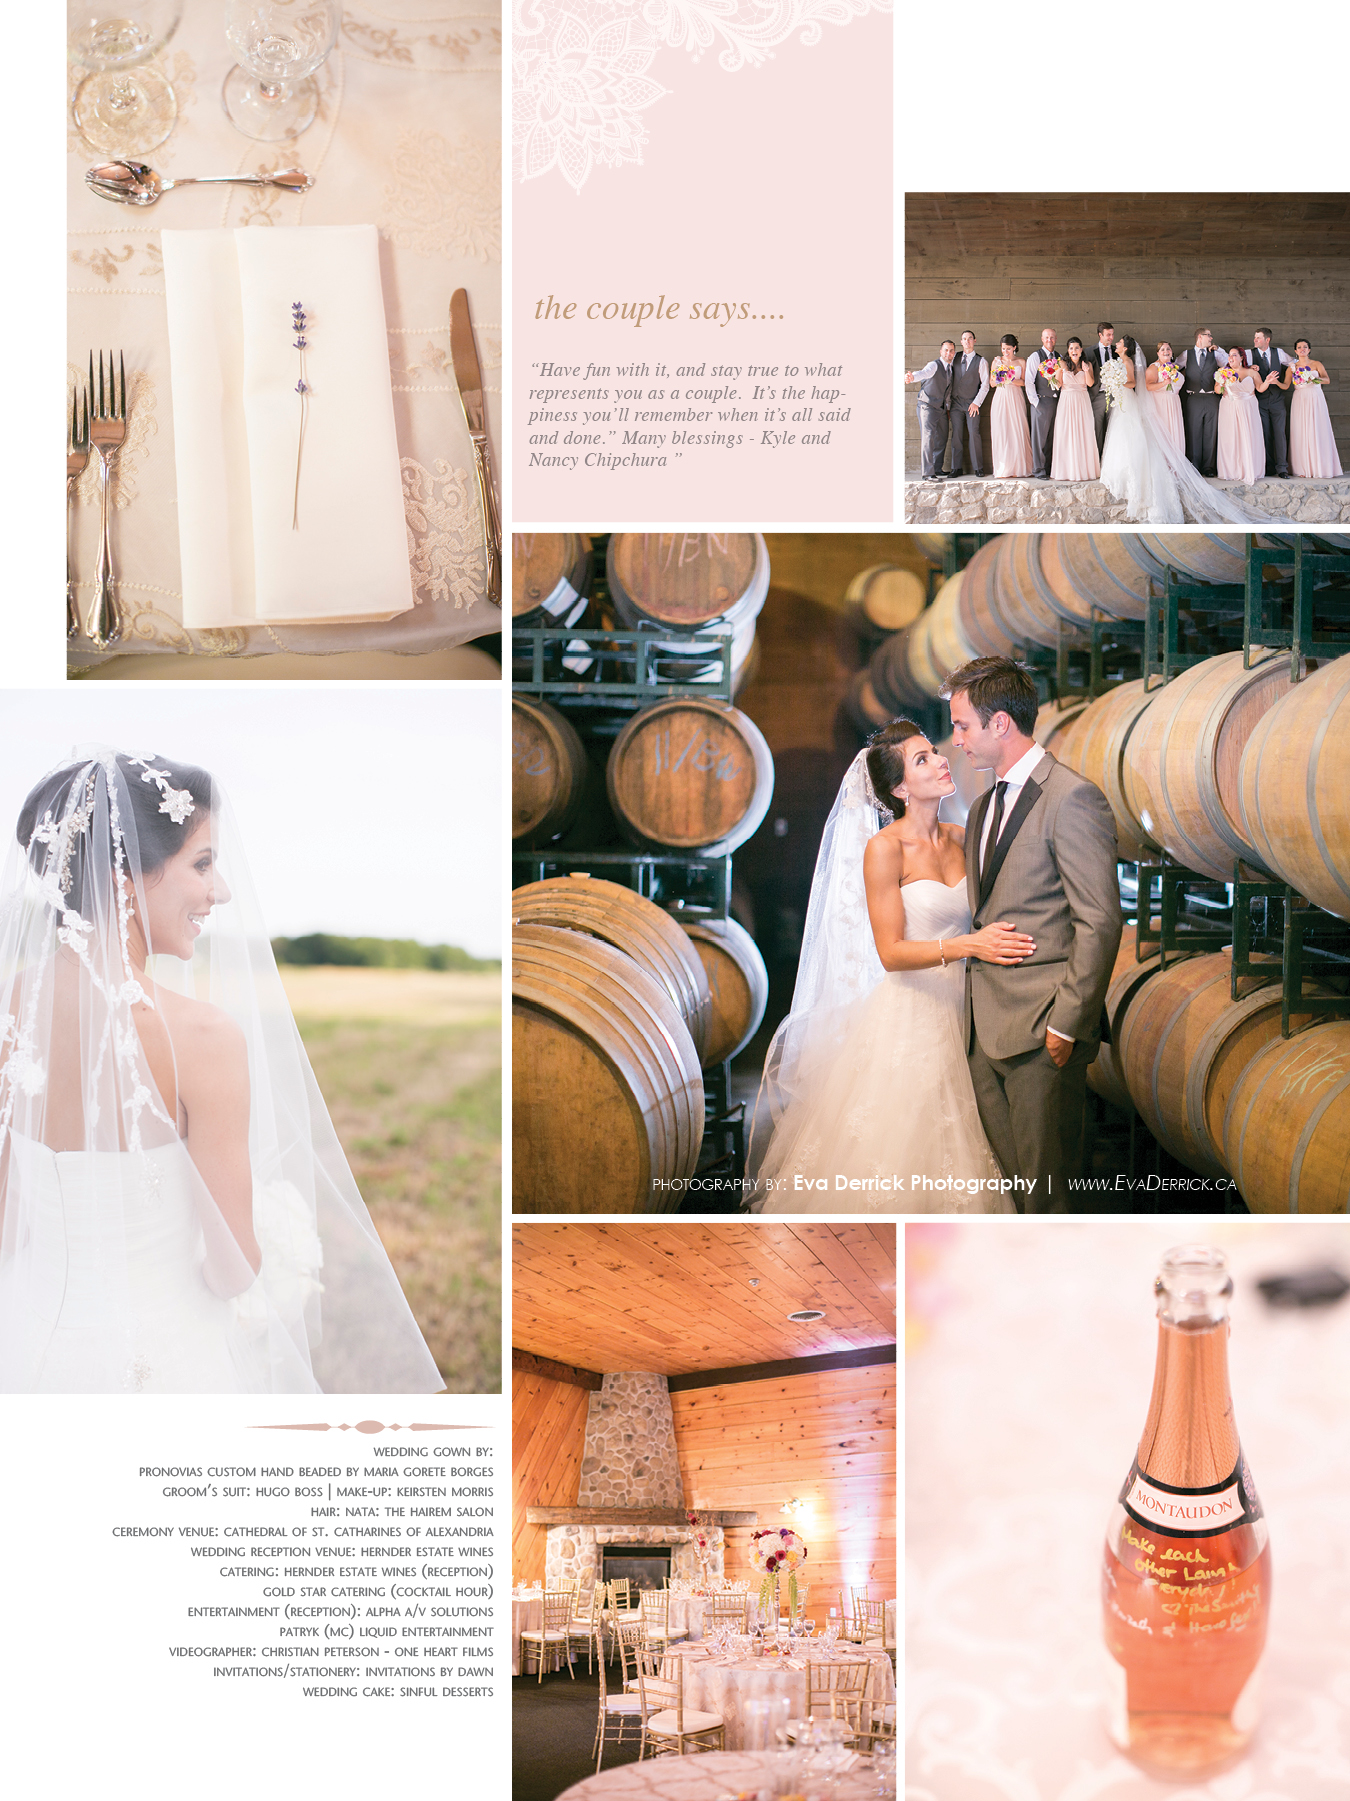 niagara-wedding-photographer-niagara-region-niagara-weddings-elegant-wedding-magazine-feature-nancy-kyle-chipchura-phoenix-coyotes-eva-derrick-photography-hernder-estate-wines-winery-vineyard-wedding-barn-wedding-1.jpg